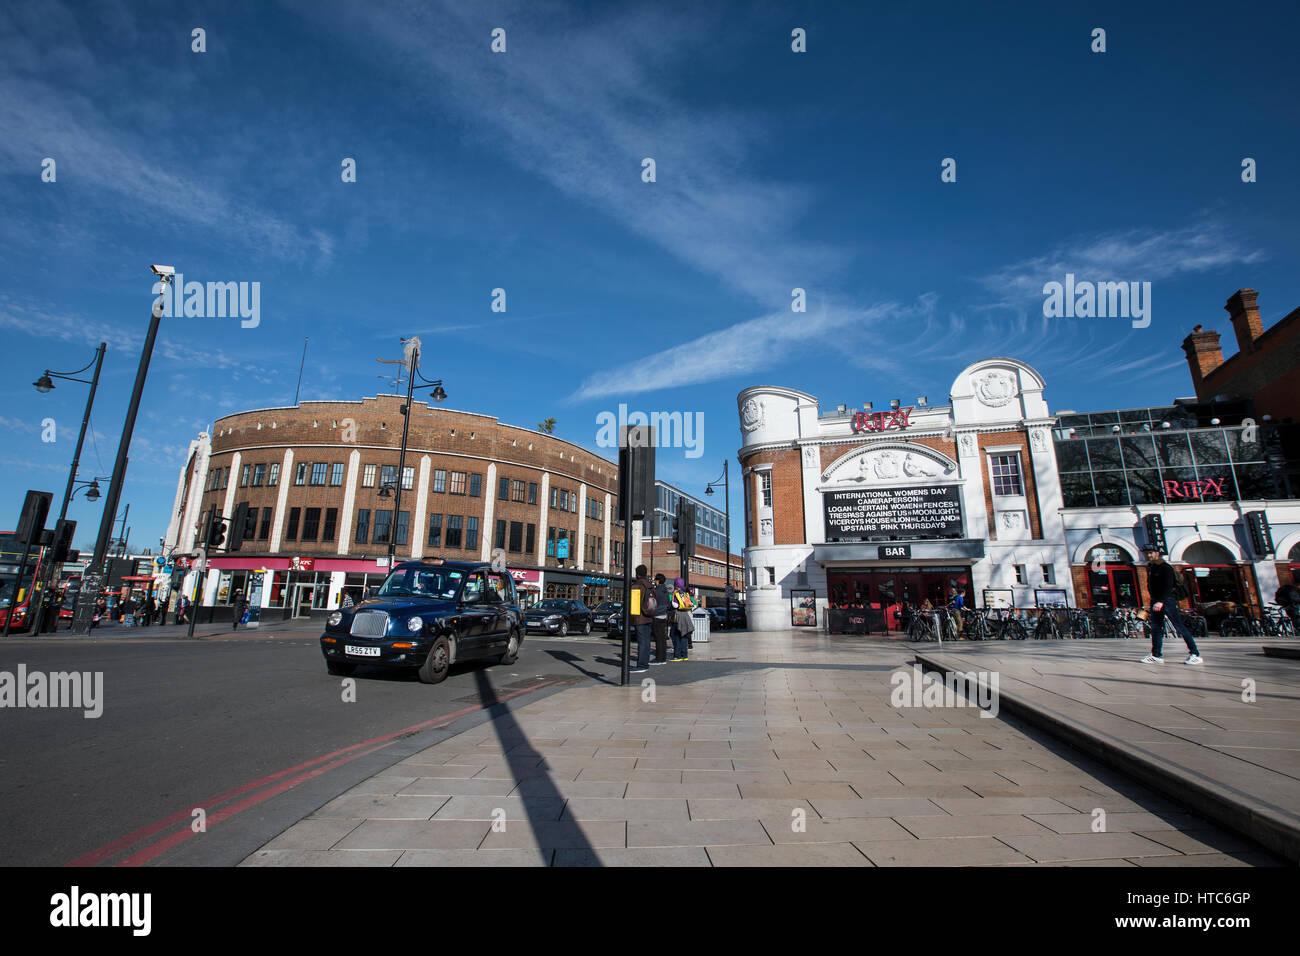 The Ritzy Cinema in Windrush Square in Brixton, London. - Stock Image